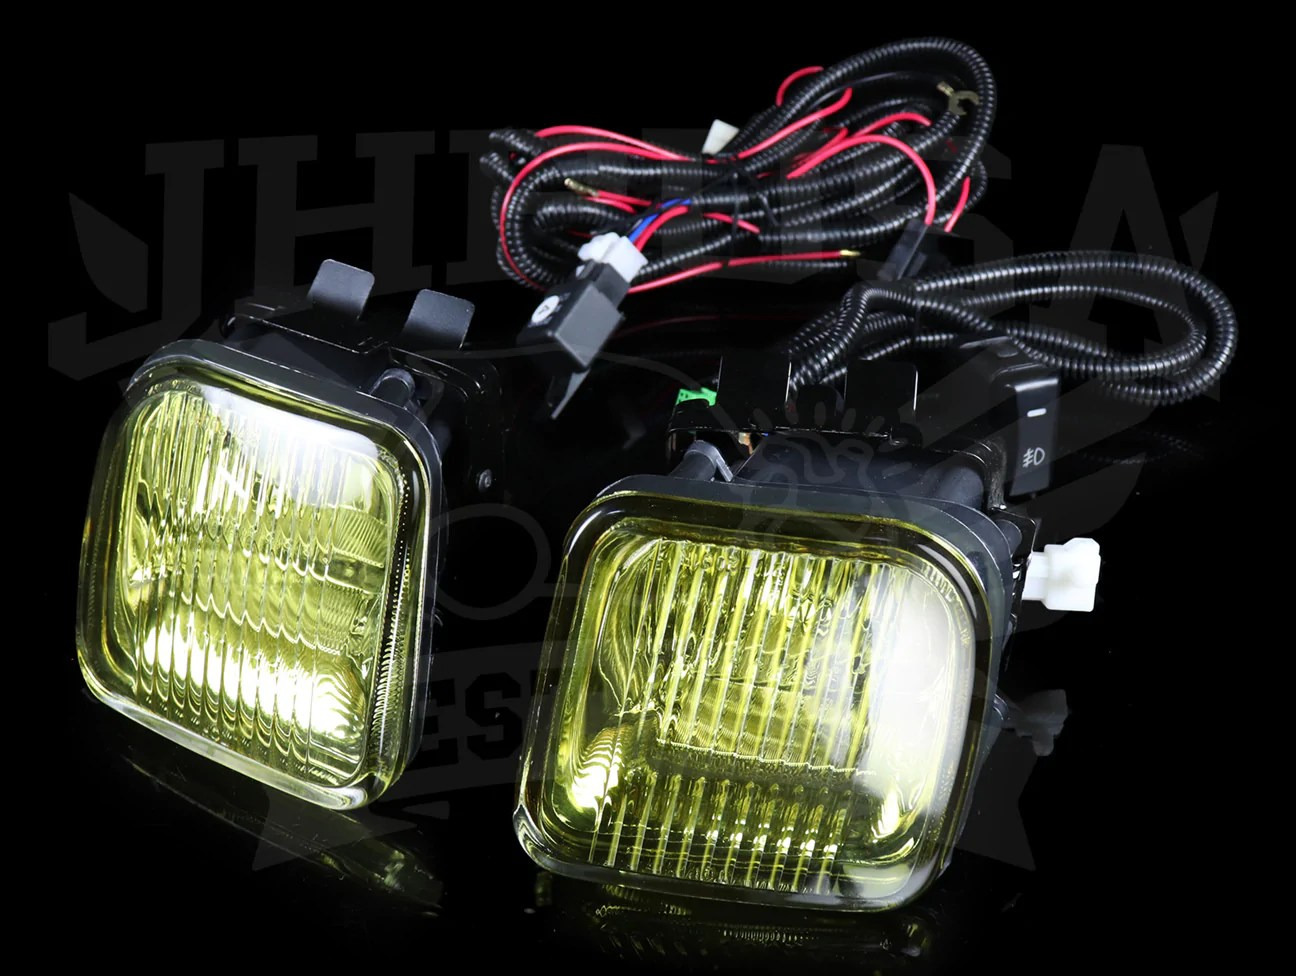 hight resolution of spec d tuning oem style yellow fog light kit 96 98 civic